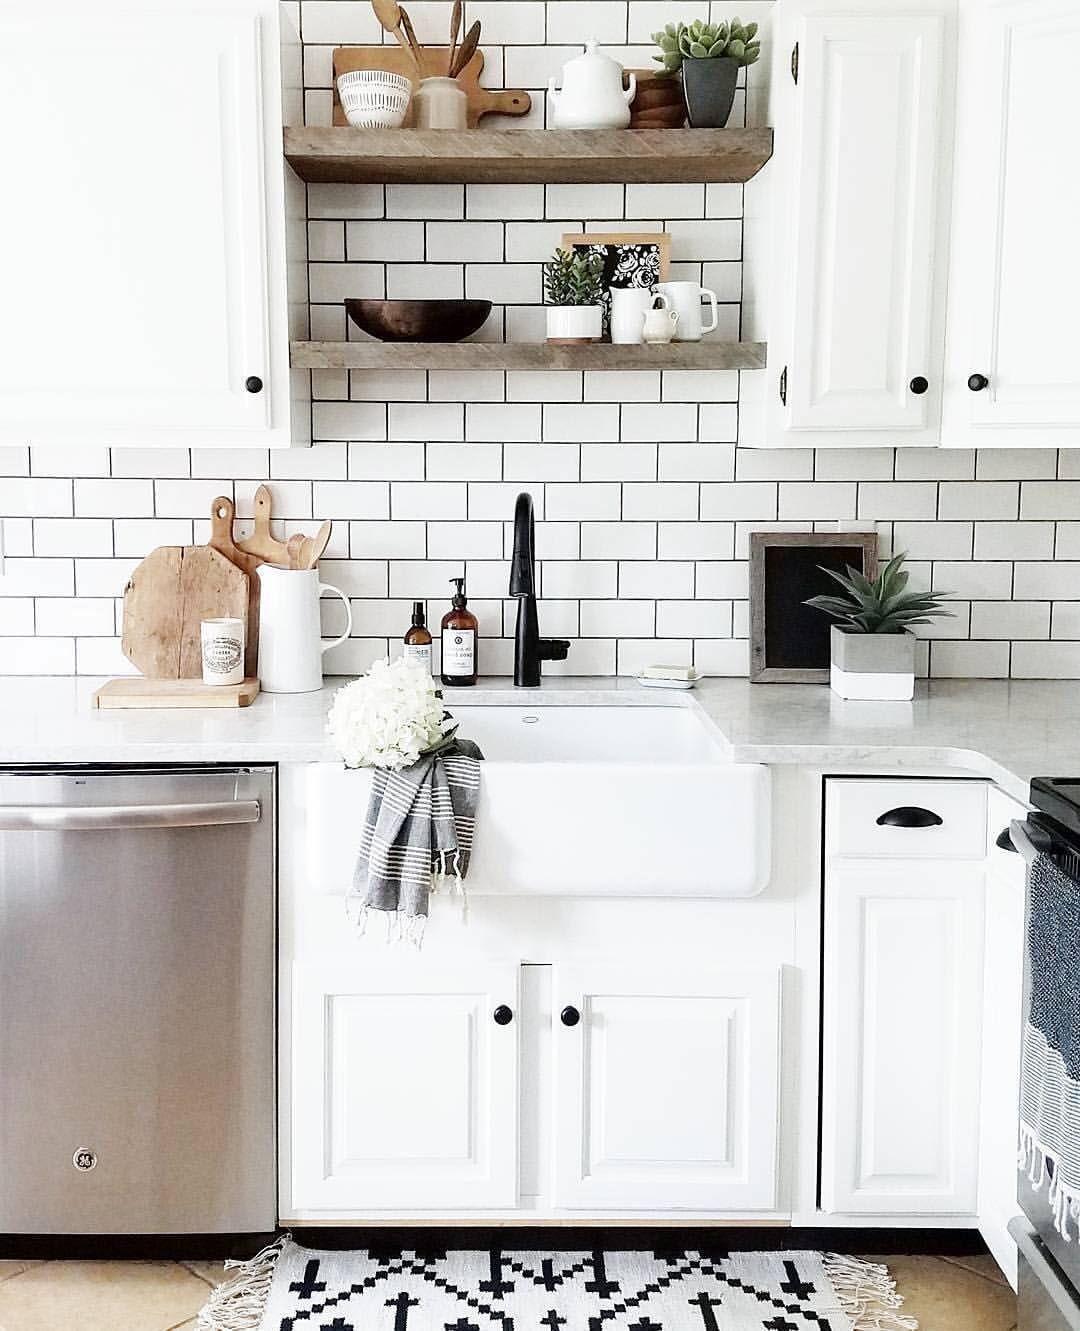 Pin de Simply Kacey en Home Sweet Home | Pinterest | Deco